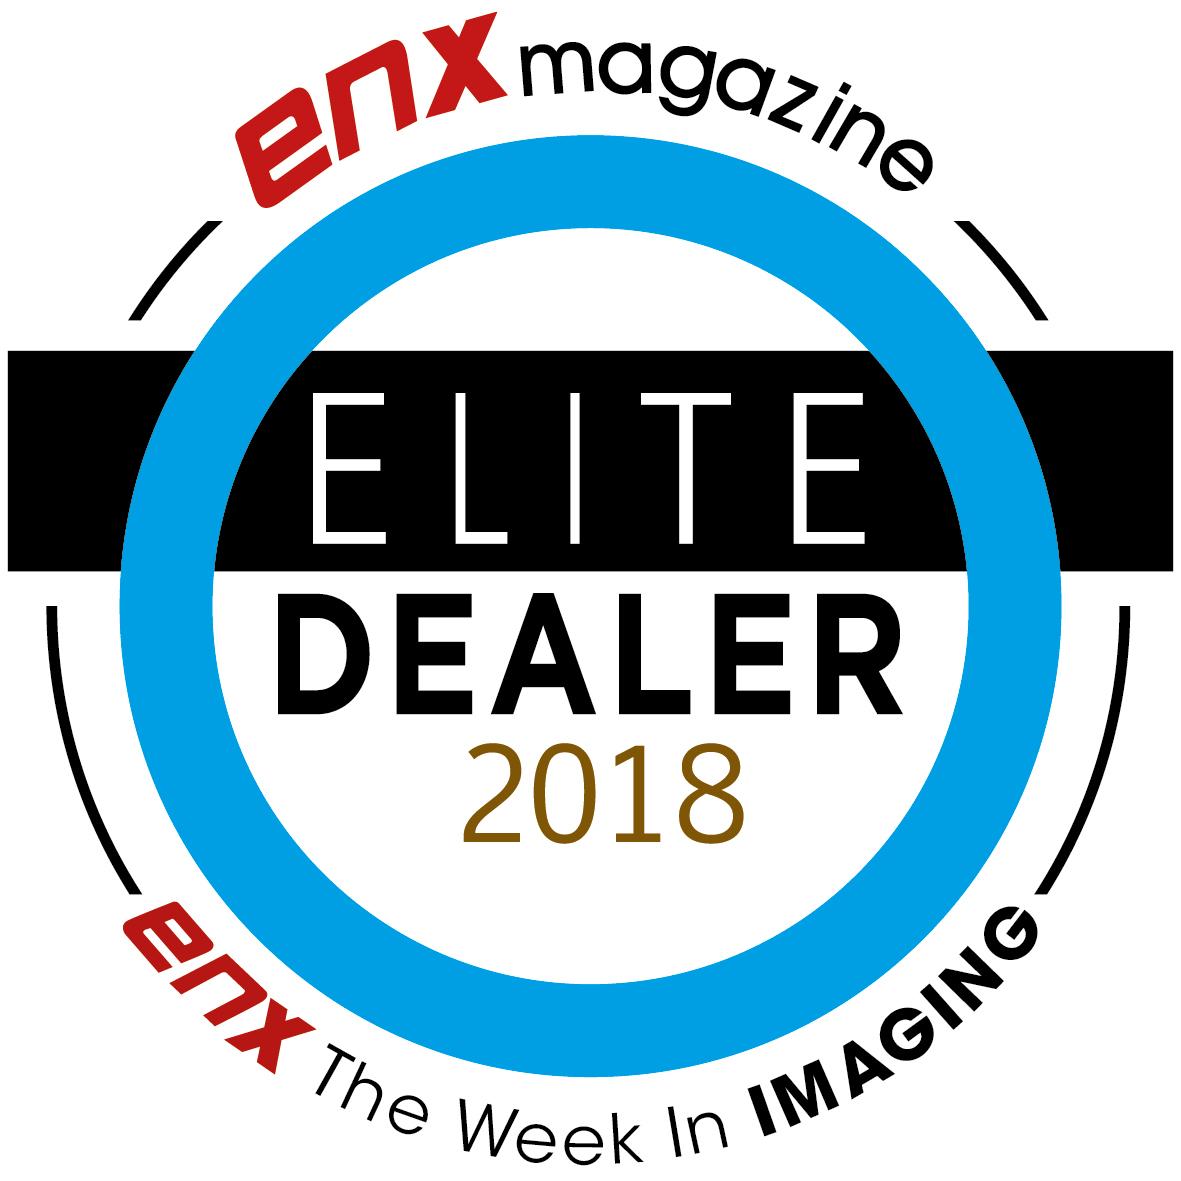 Elite Dealer 2018